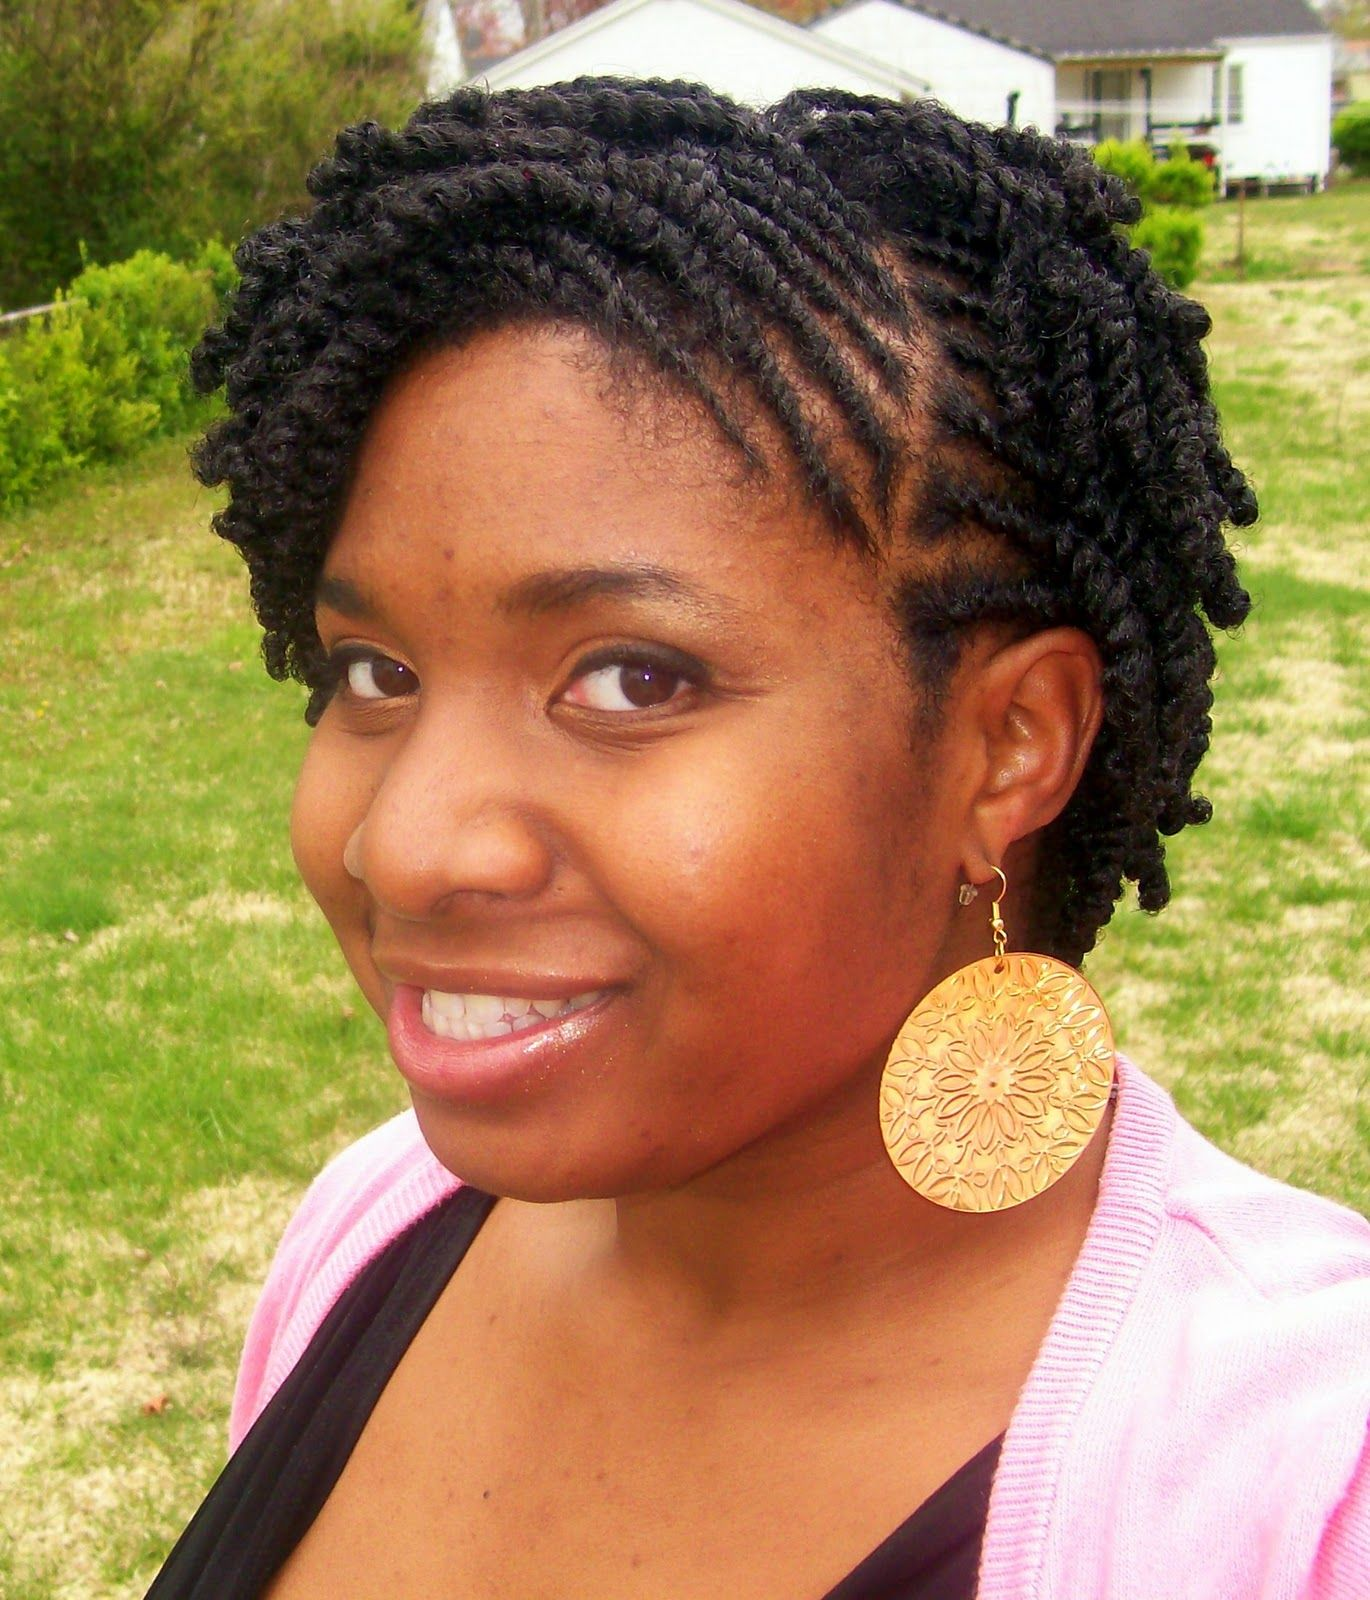 Prime 1000 Images About Natural Hair On Pinterest Black Women Natural Short Hairstyles For Black Women Fulllsitofus